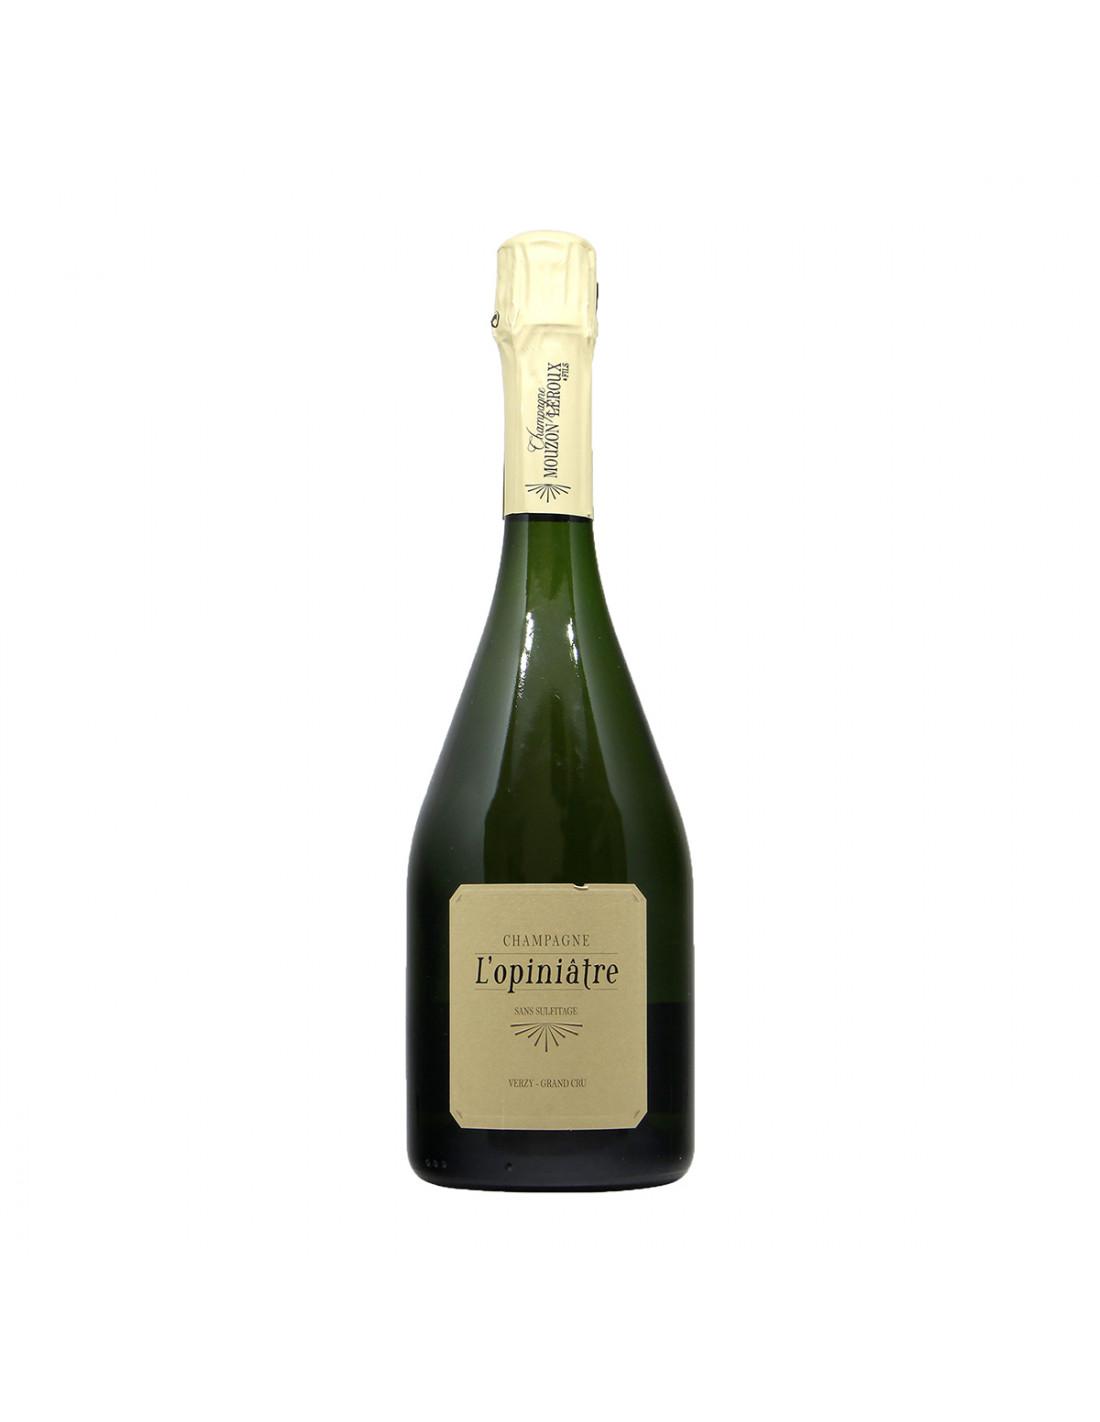 Mouzon Leroux Champagne Opiniatre Blanc Grand Cru Nature 2010 Grandi Bottiglie